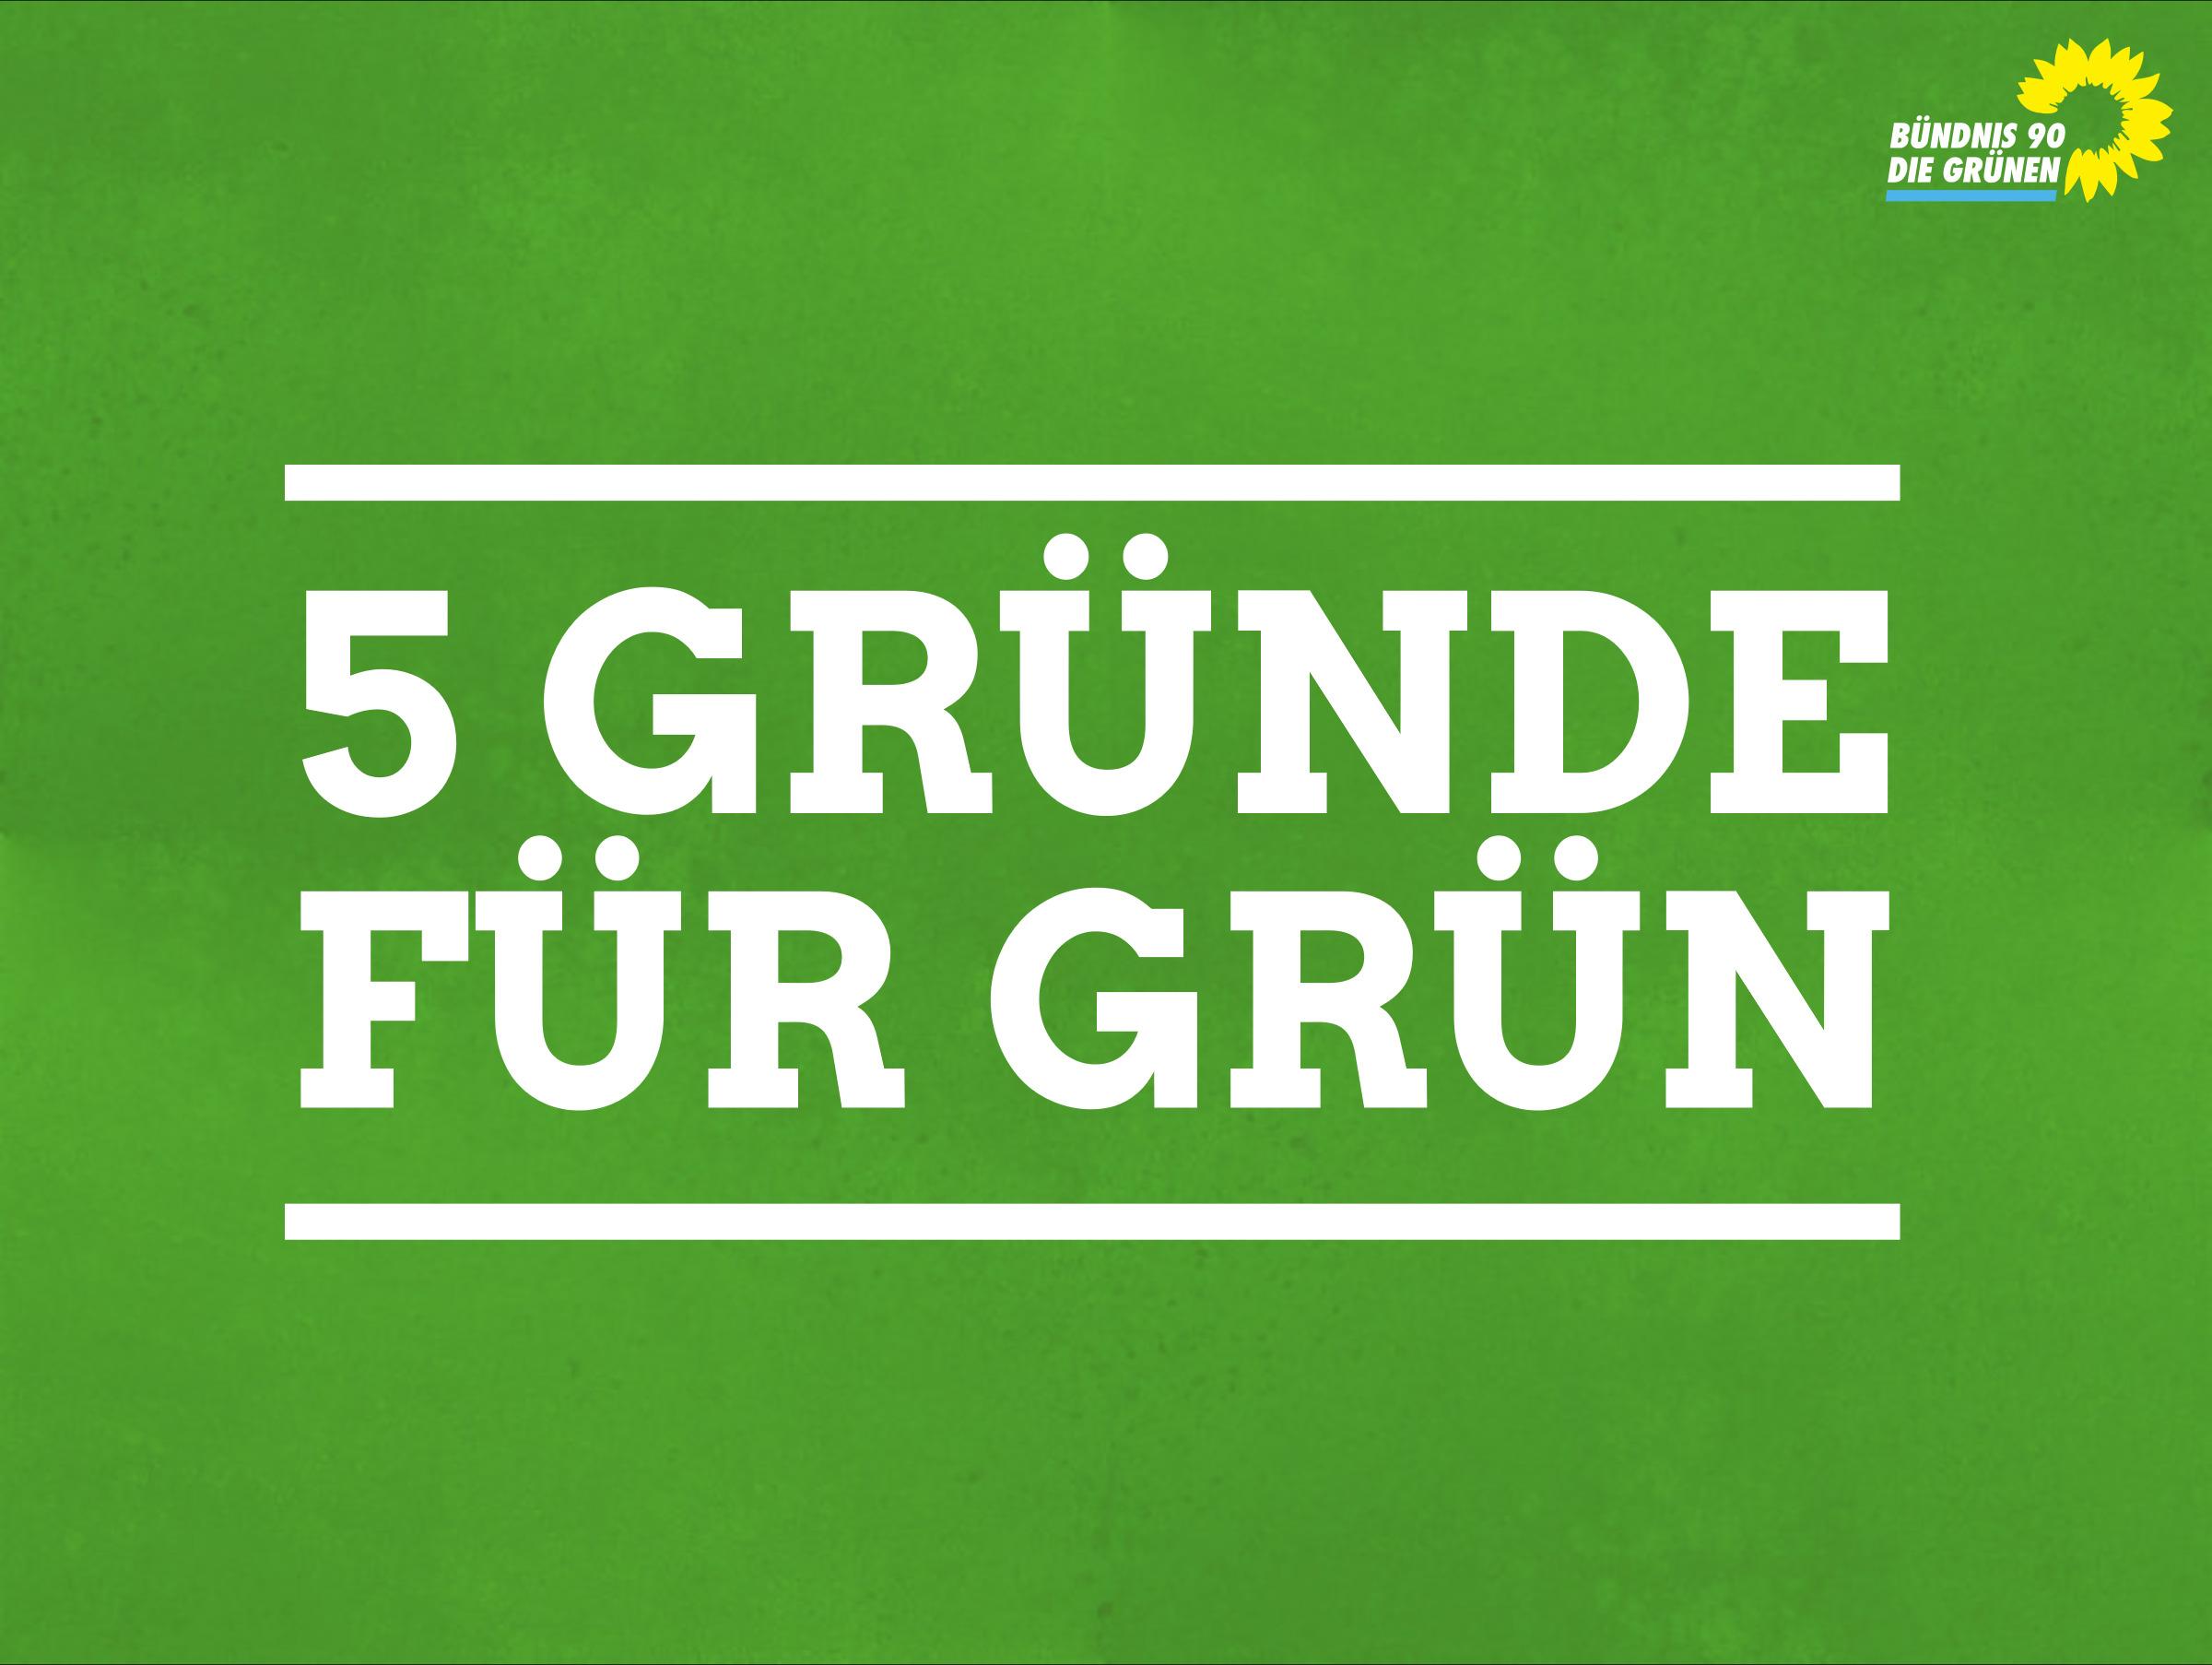 5 Gründe für Grün